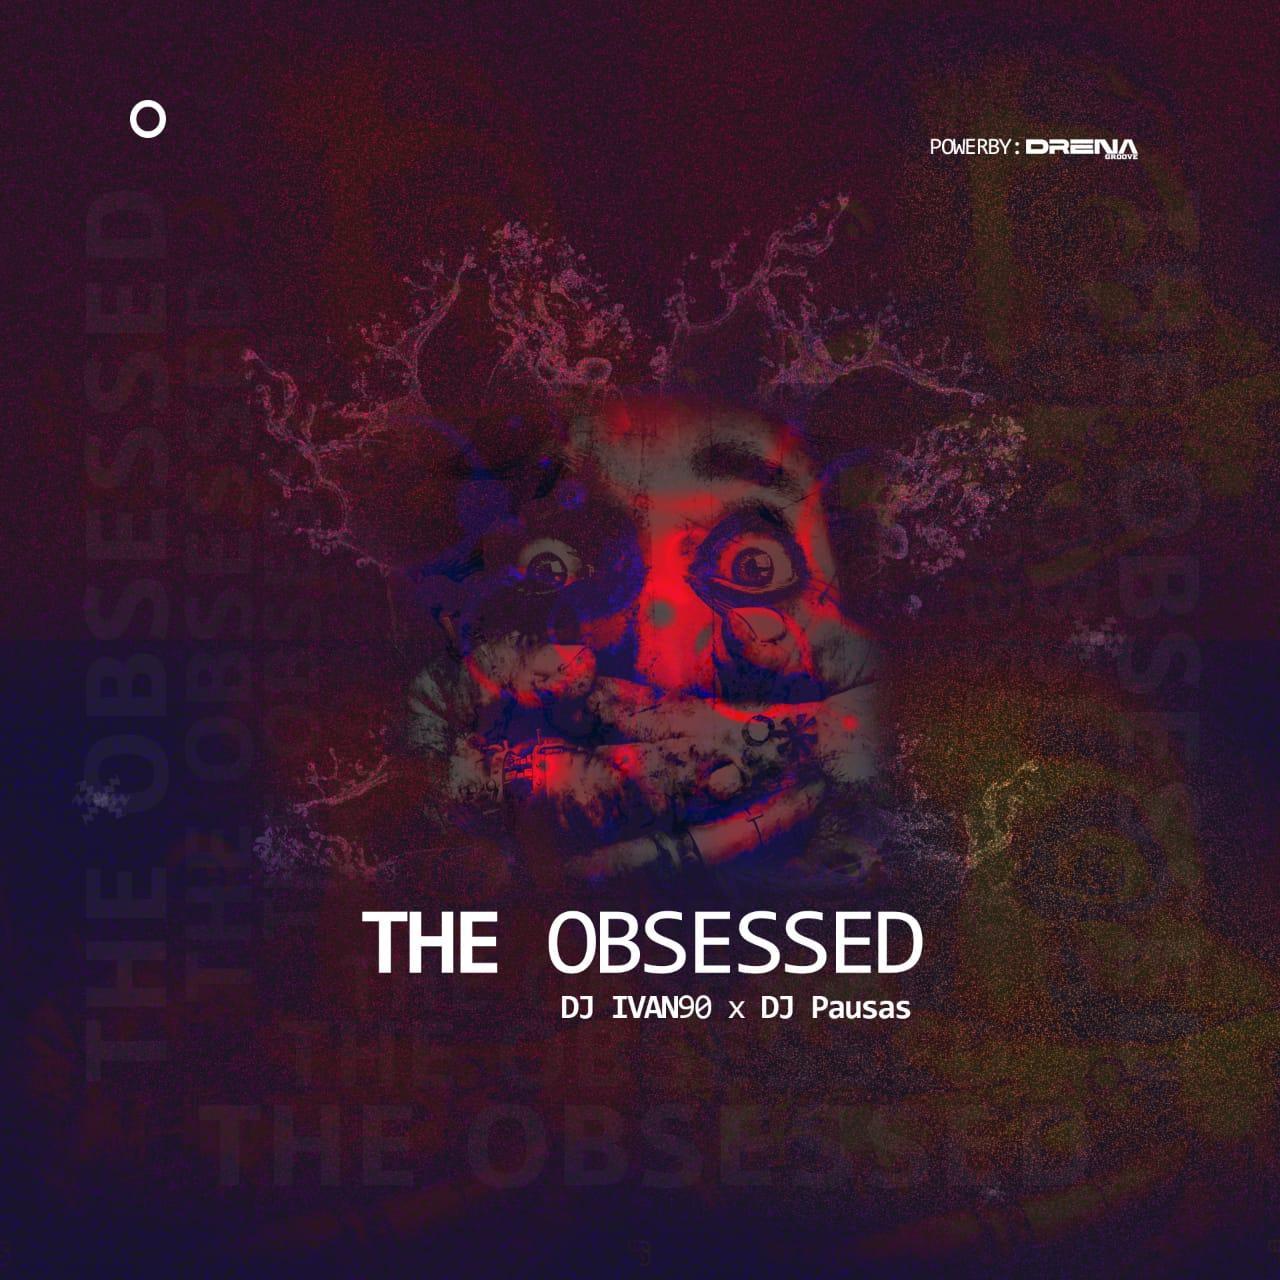 Dj Ivan90 & Dj Pausas - The Obsessed (Reprise)